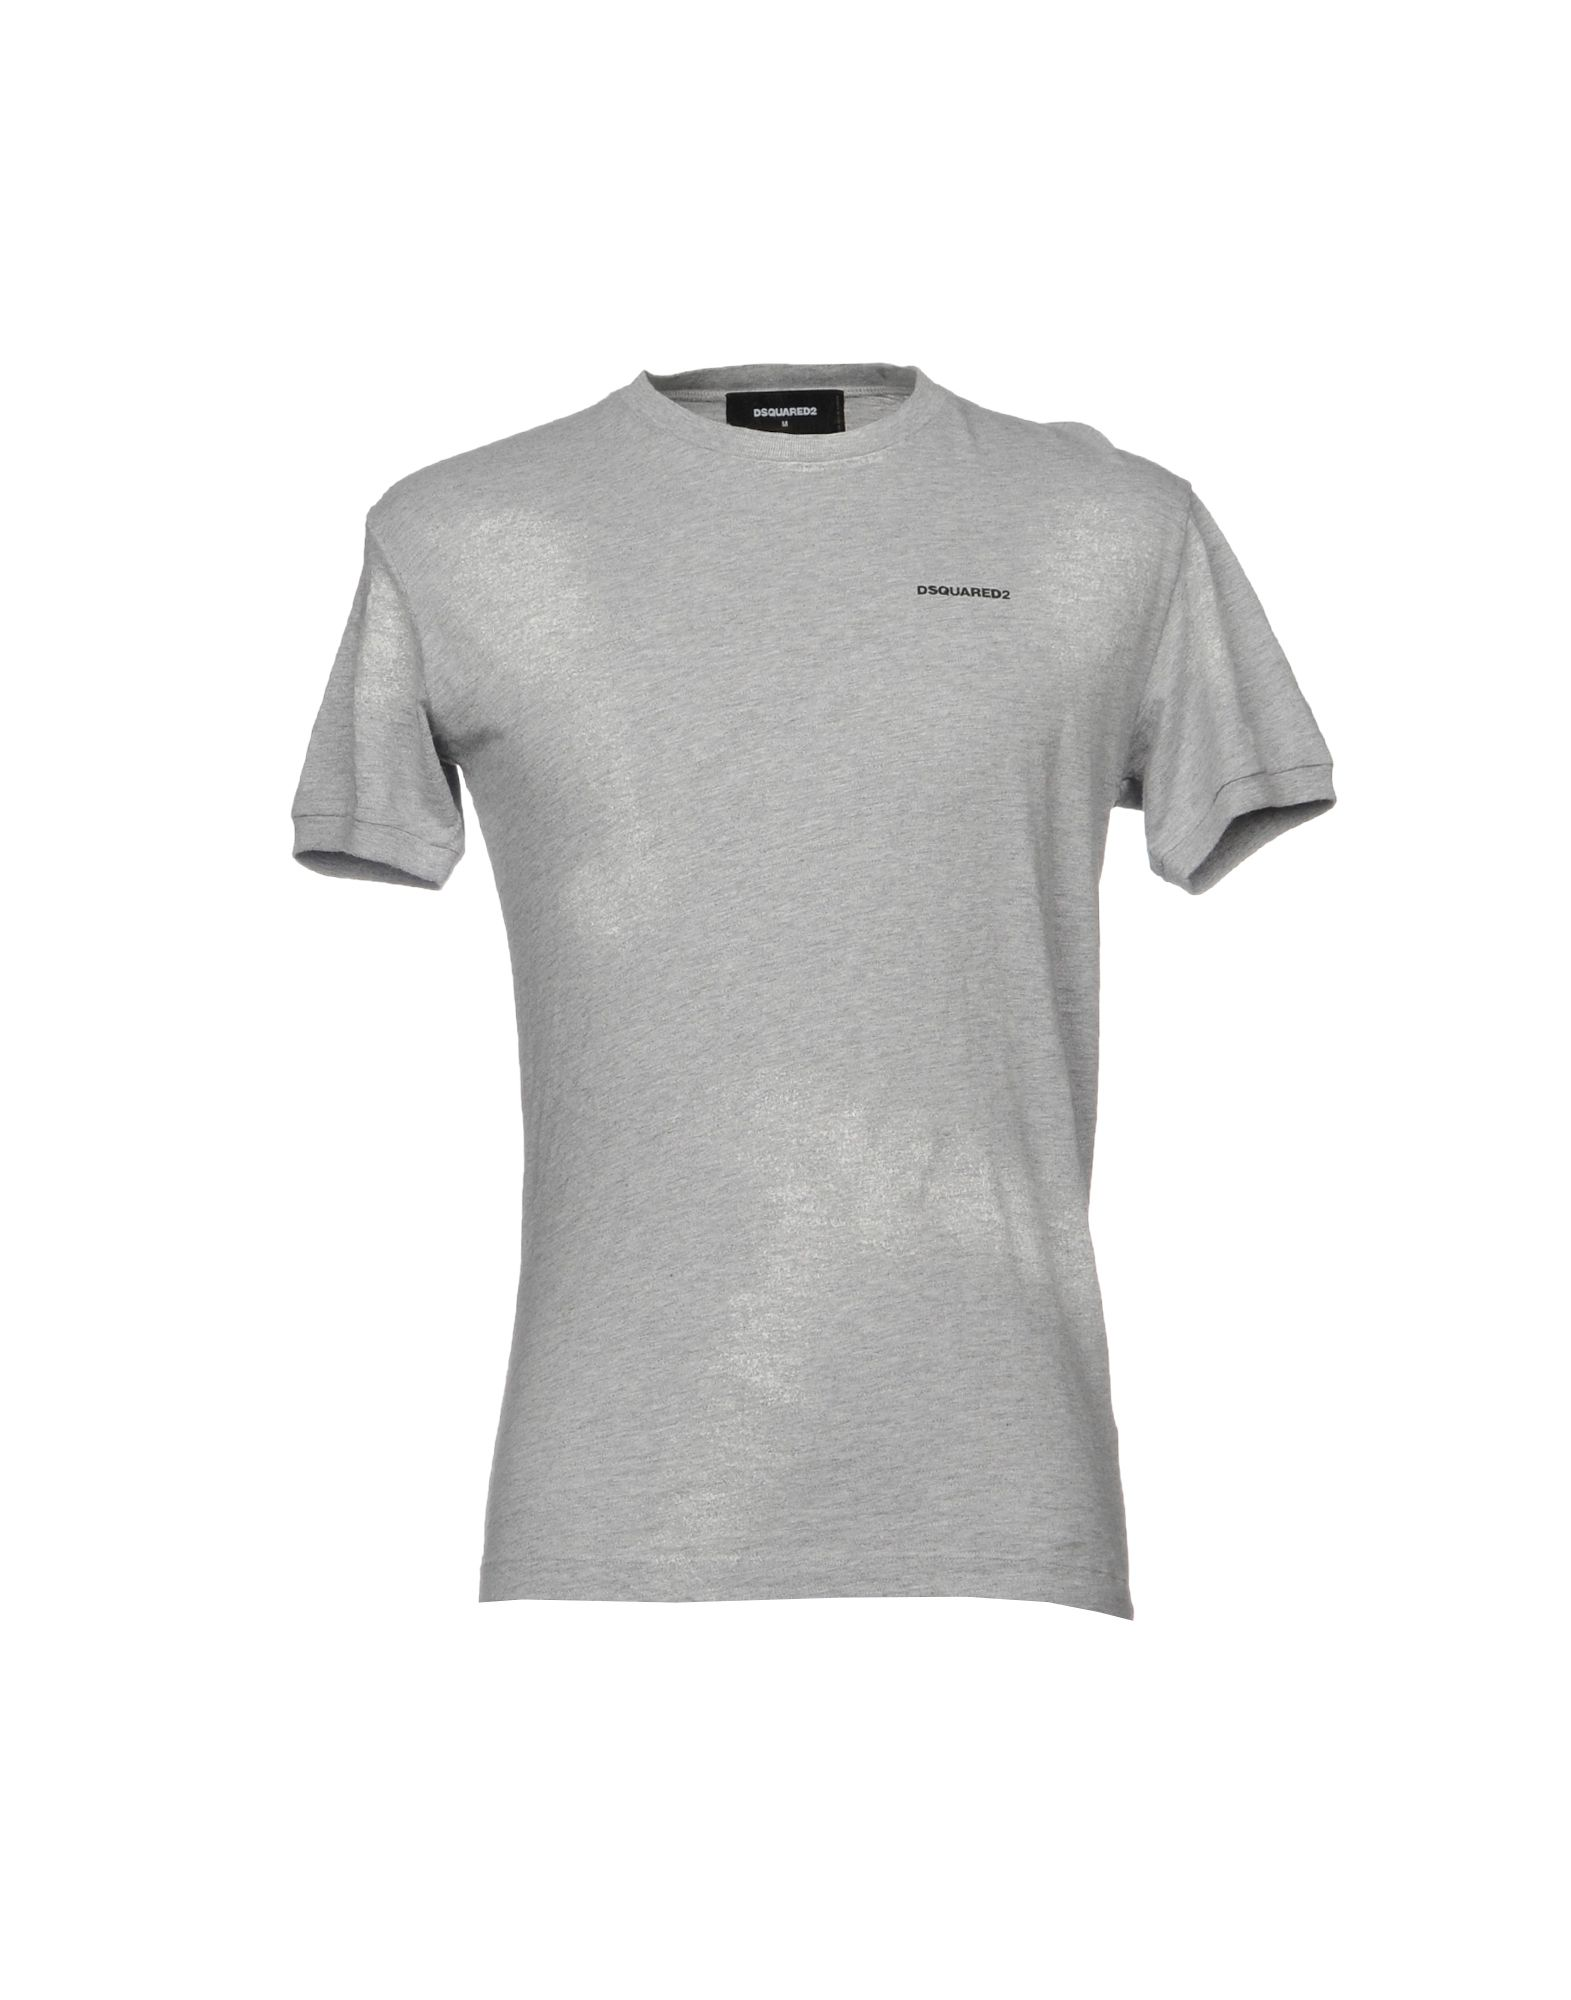 DSQUARED2 Herren T-shirts Farbe Grau Größe 6